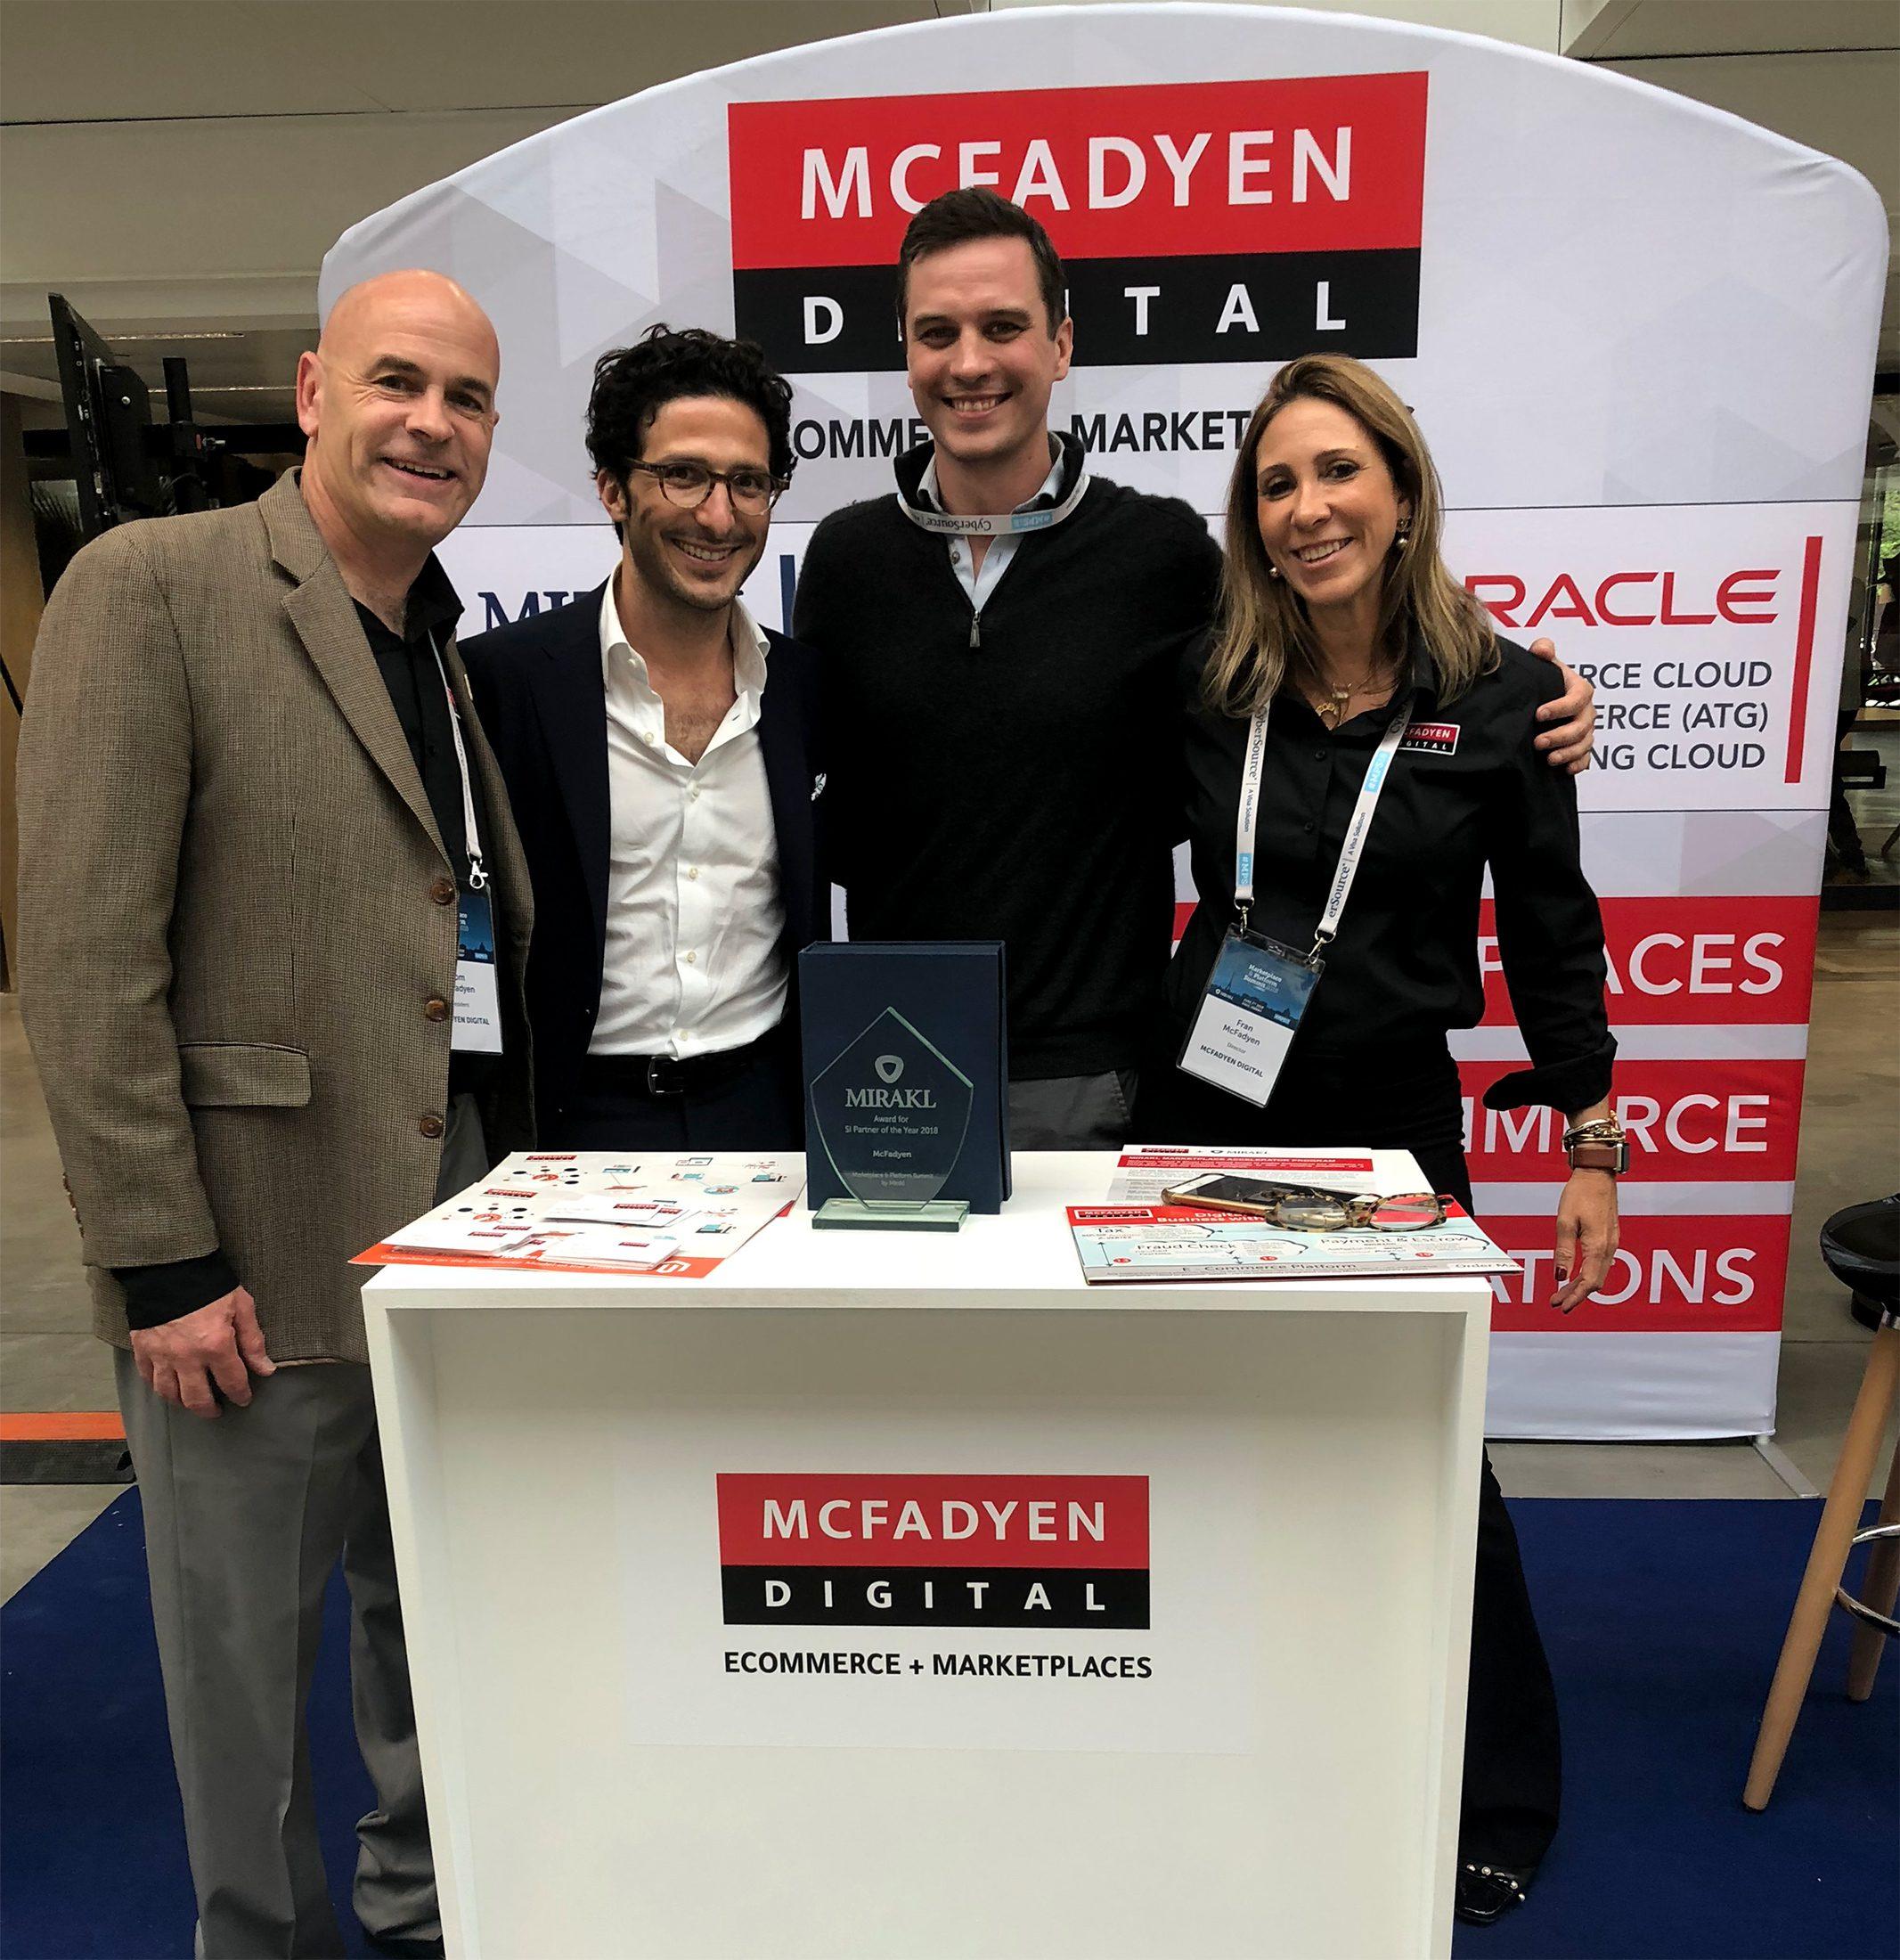 McFadyen Team with Adrien Nussenbaum, US CEO of Mirakl